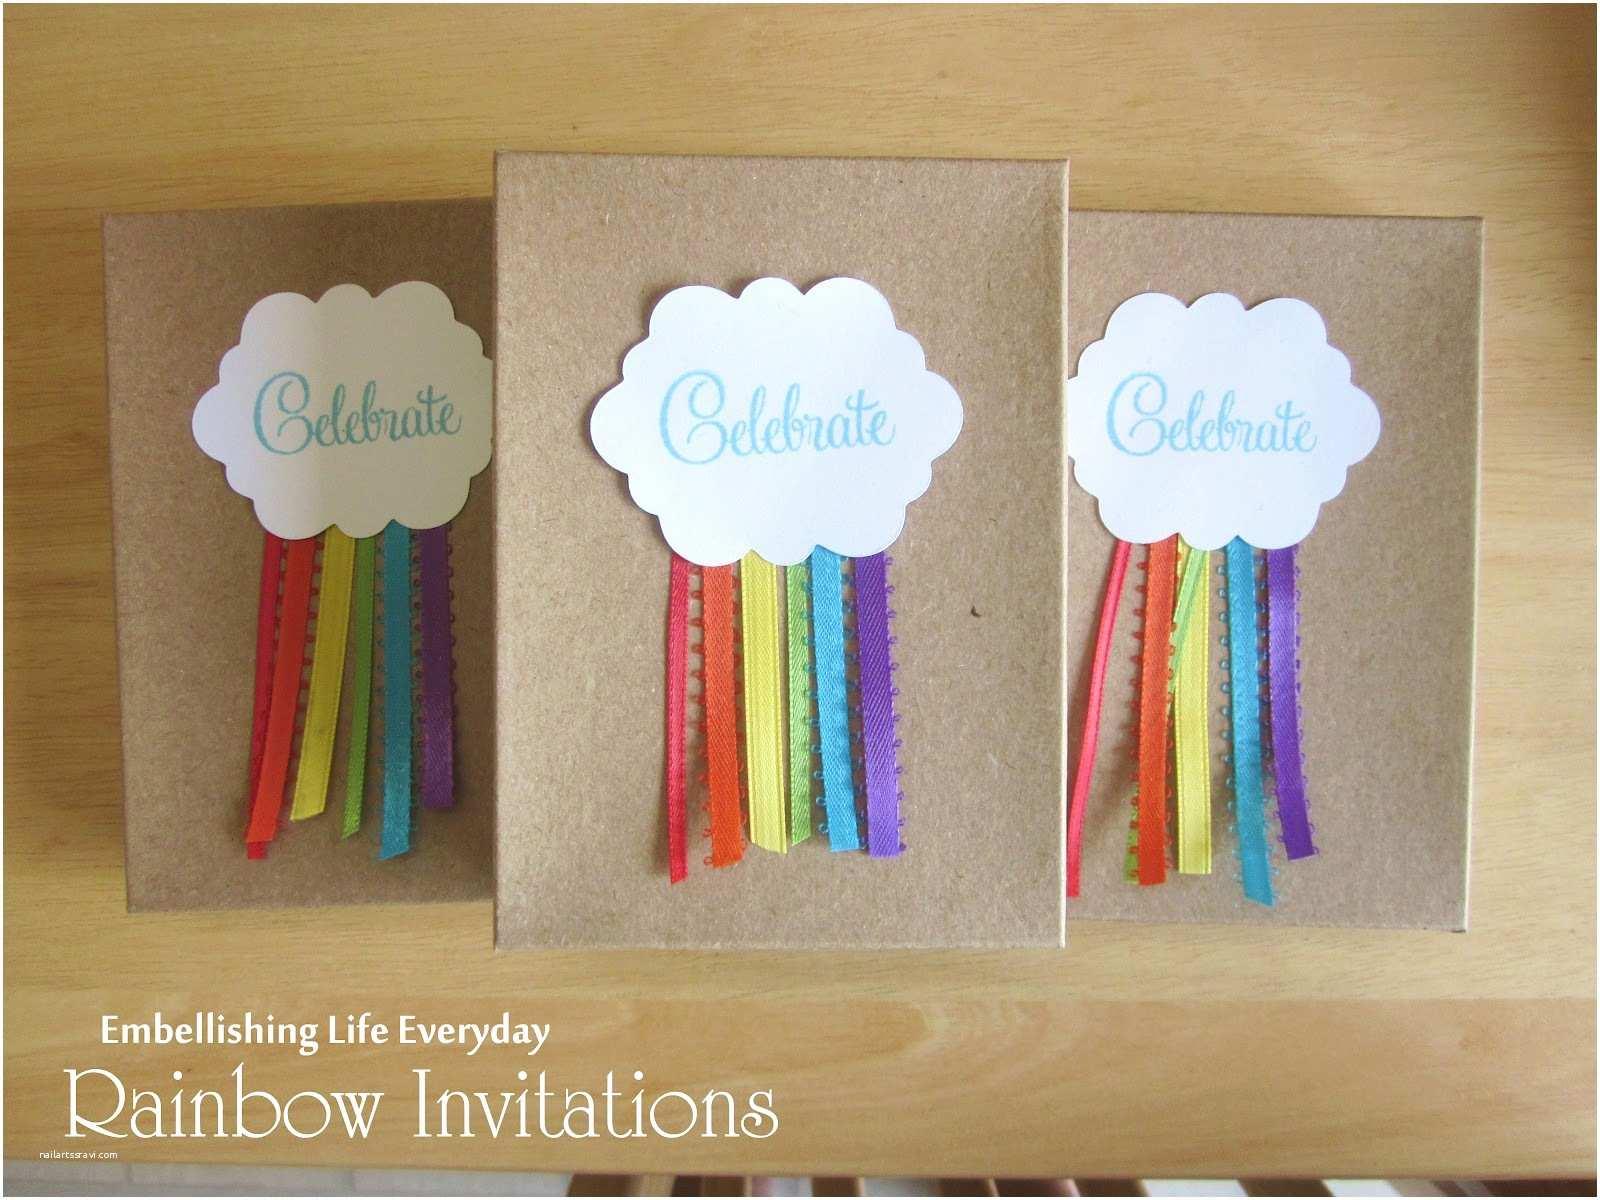 Rainbow Party Invitations Embellishing Life Rainbow Invitation